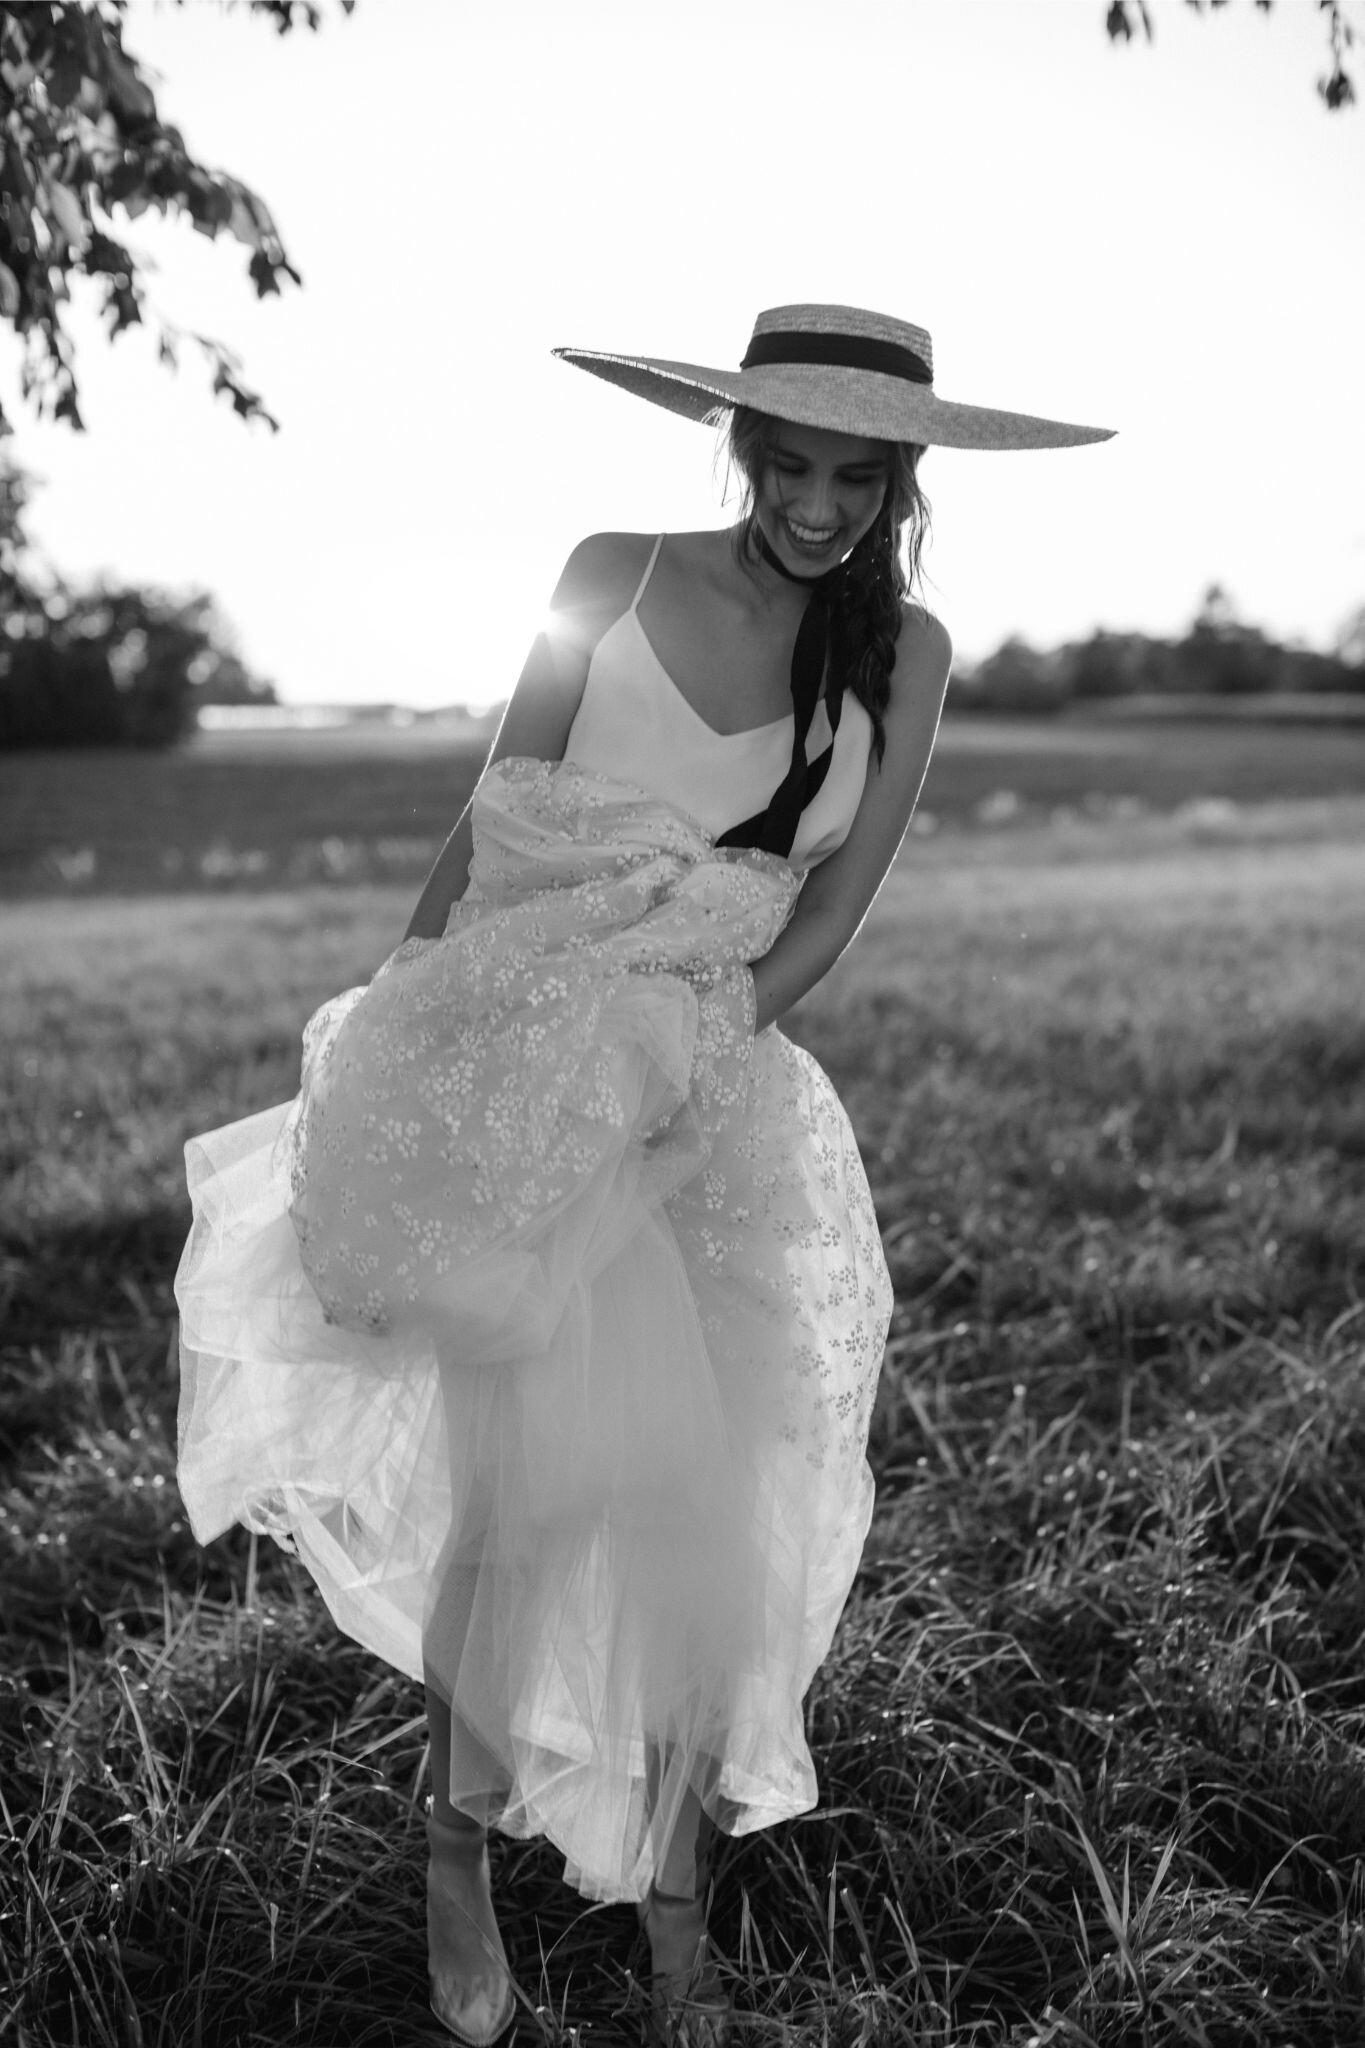 the-saums-bebas-closet-germaine-skirt-summer-bride-fashion-editorial-29.jpg